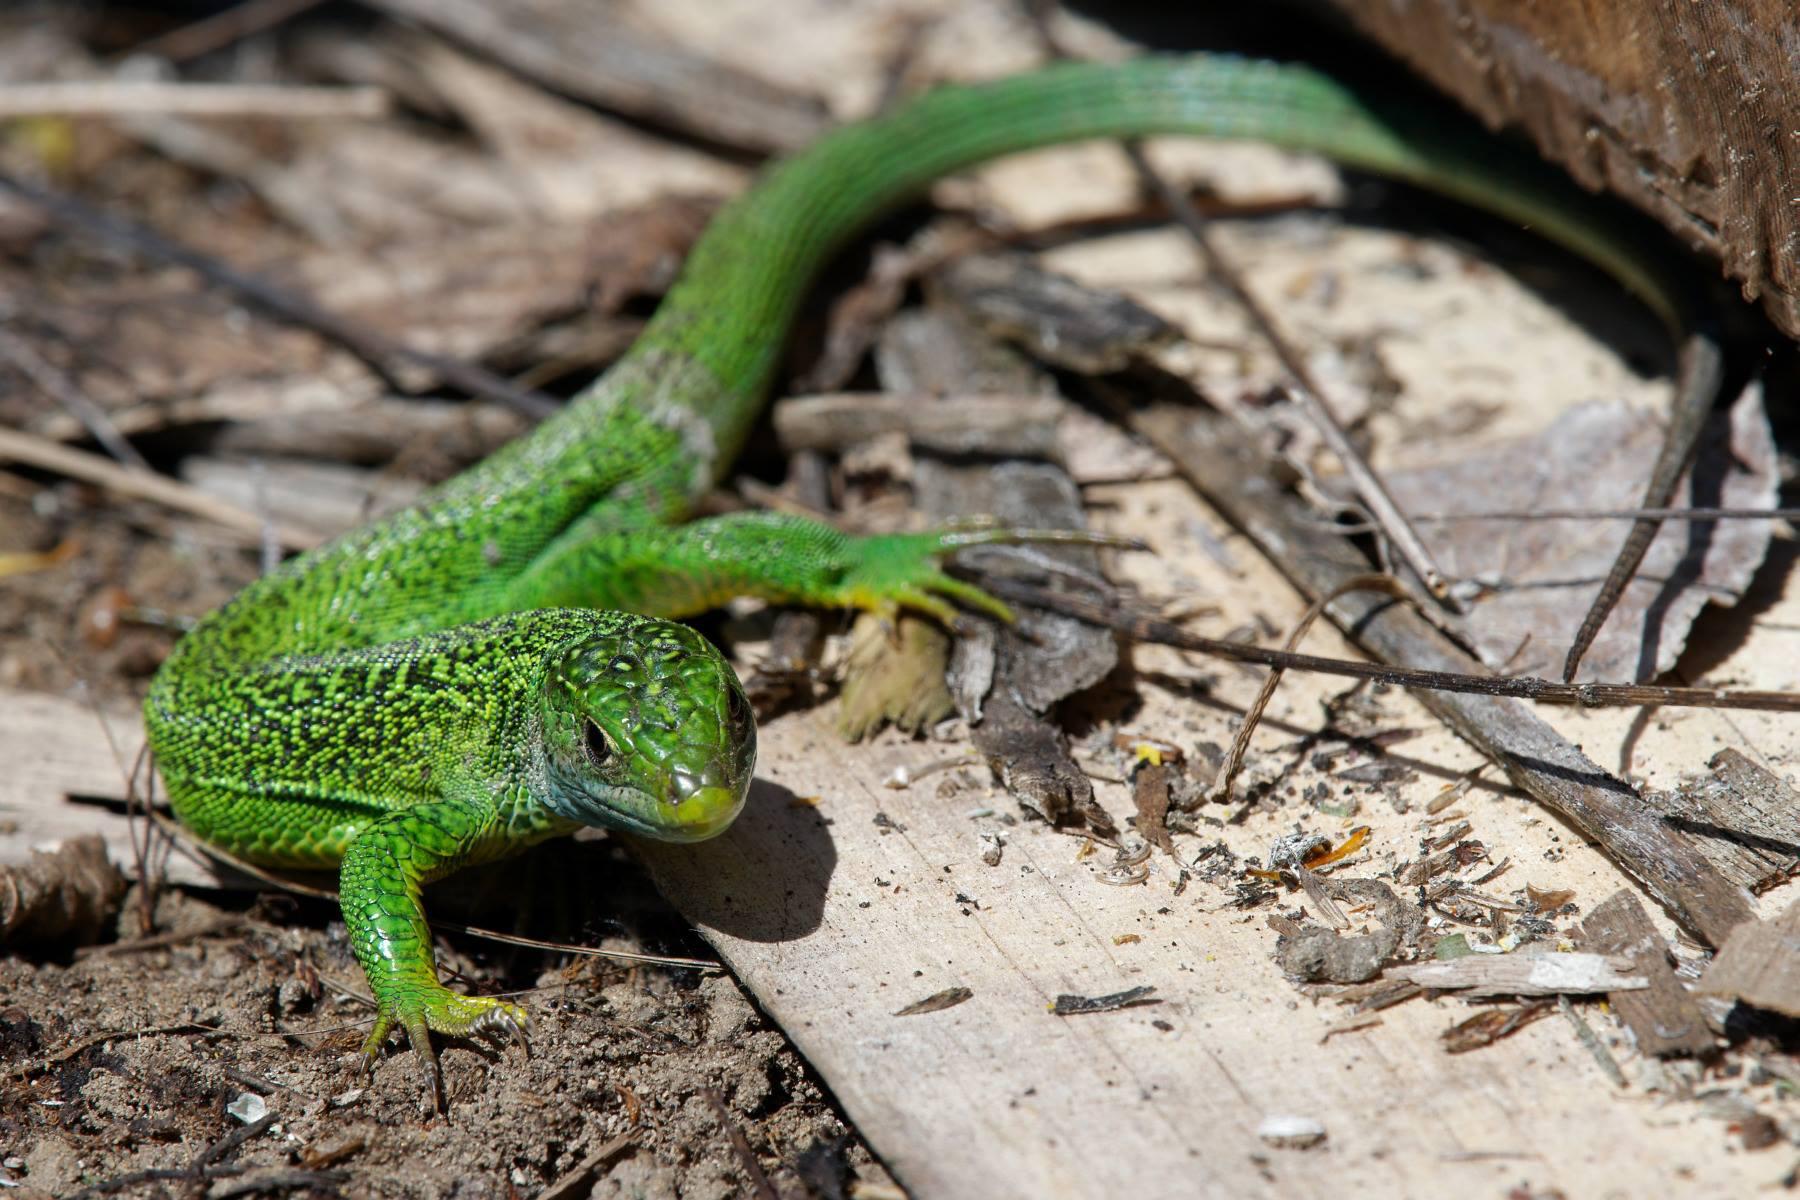 http://files.biolovision.net/www.faune-ain.org/userfiles/GroupeHerpeto/Photossortie/1805601813074888026732208867192261523638647o.jpg